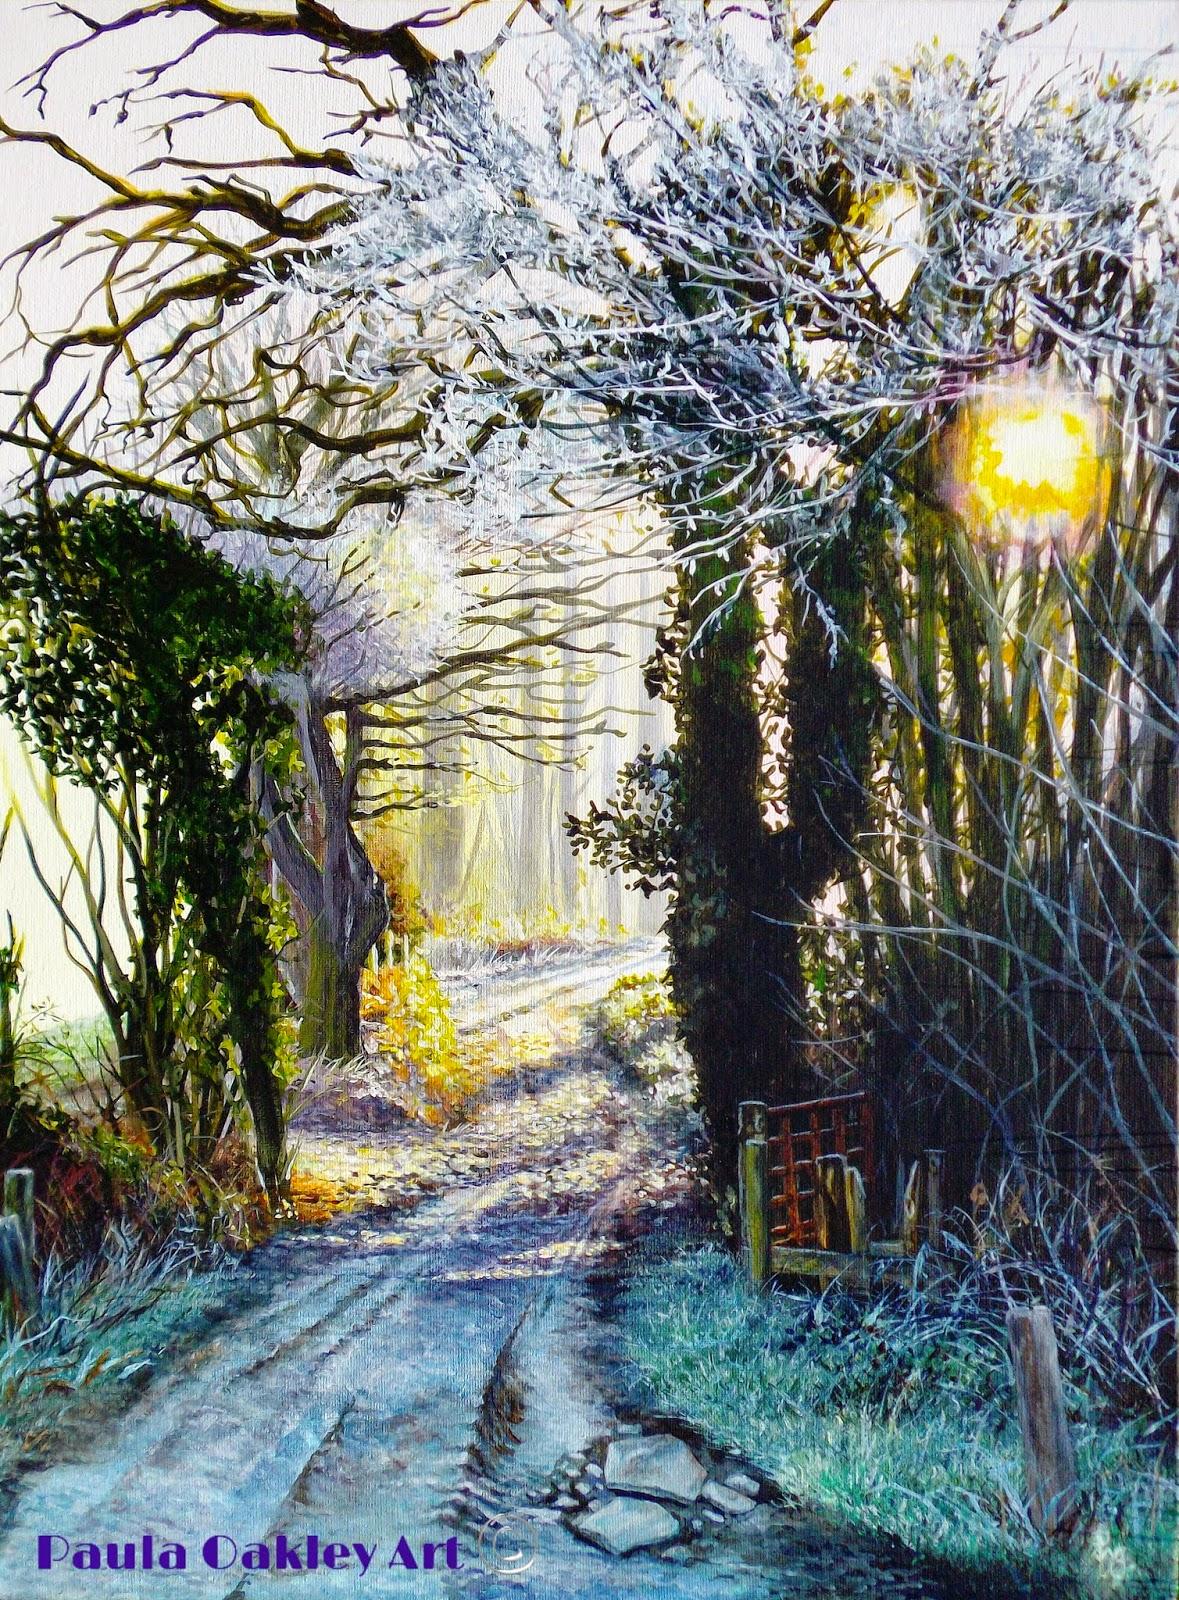 ORIGINAL ART By Paula Oakley Sussex Paintings For Sale